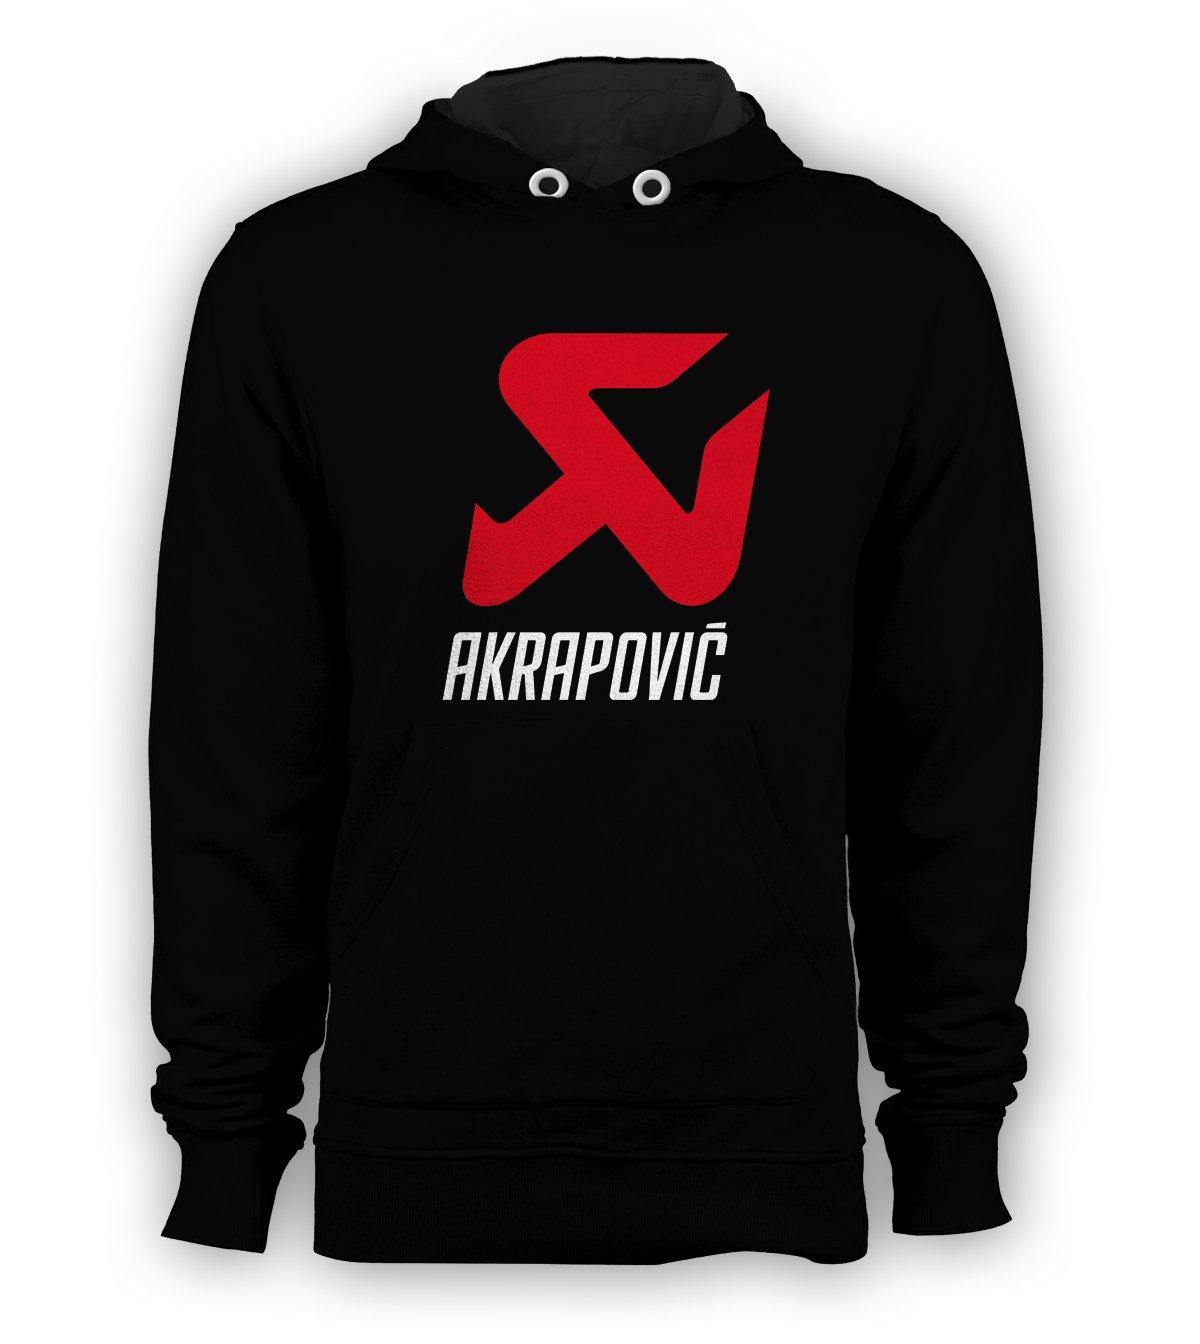 Akrapovic Exhaust Racing MotoGP Pullover Hoodie Men Sweatshirts Size S to 3XL New Black